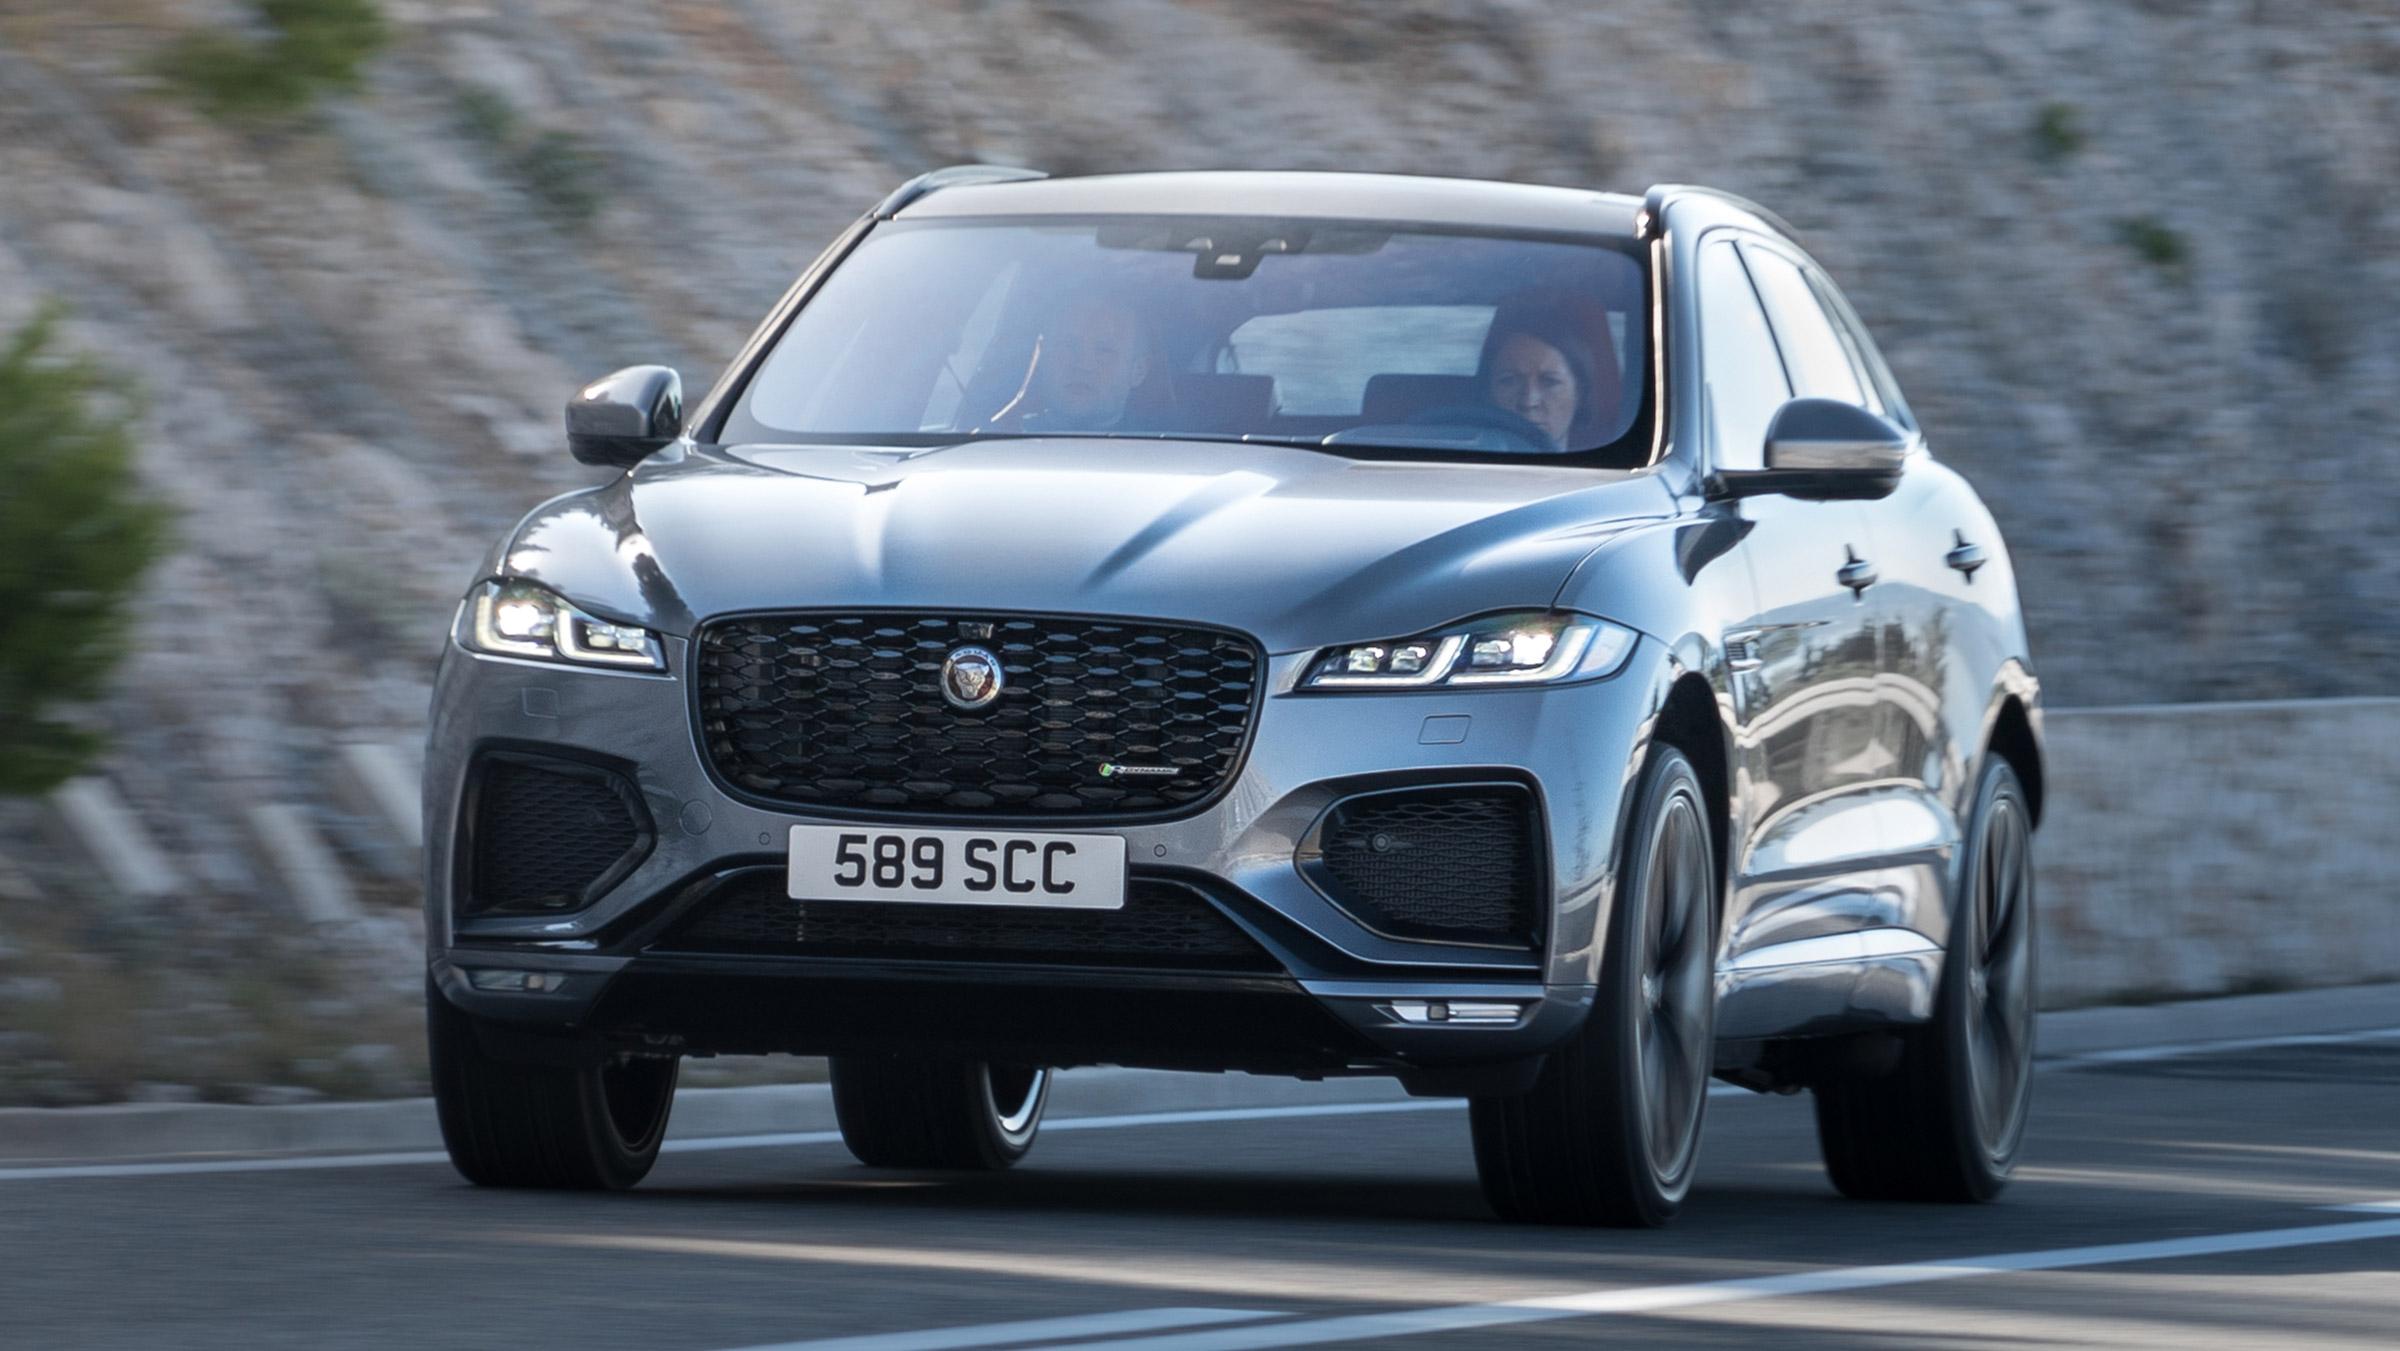 New Jaguar F-Pace facelift arrives with plug-in hybrid ...